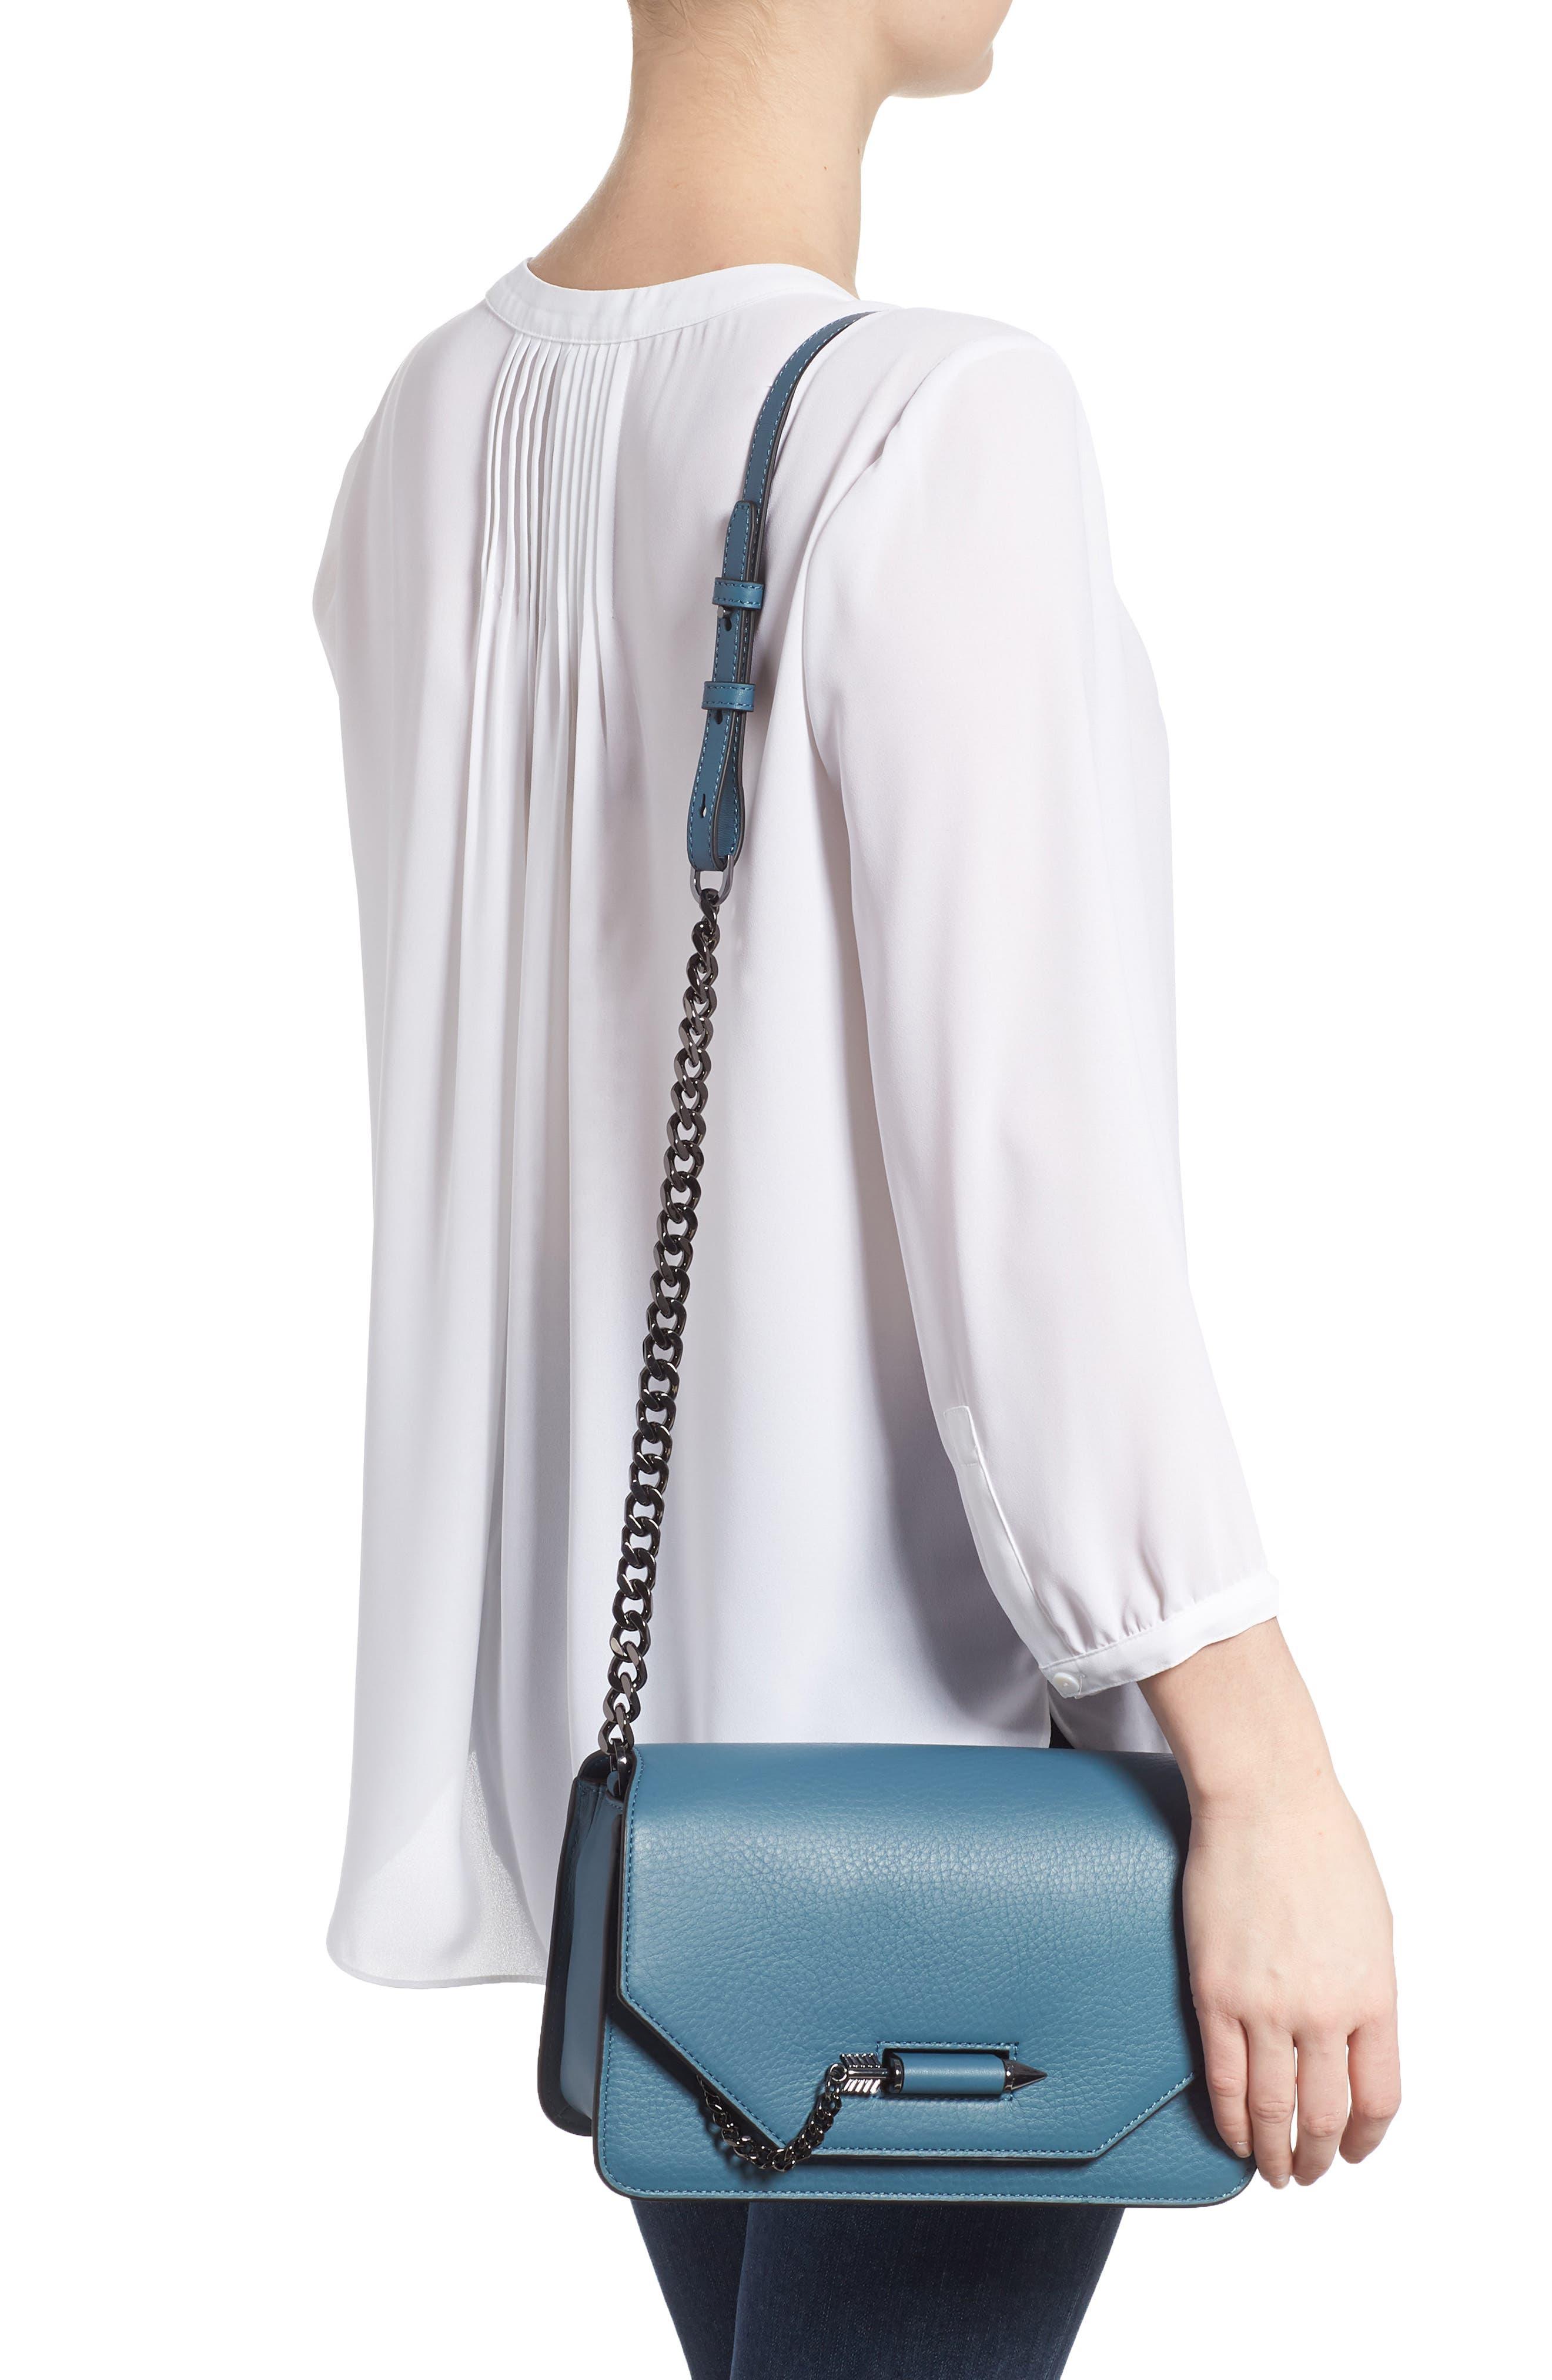 Cortney Nappa Leather Shoulder/Crossbody Bag,                             Alternate thumbnail 7, color,